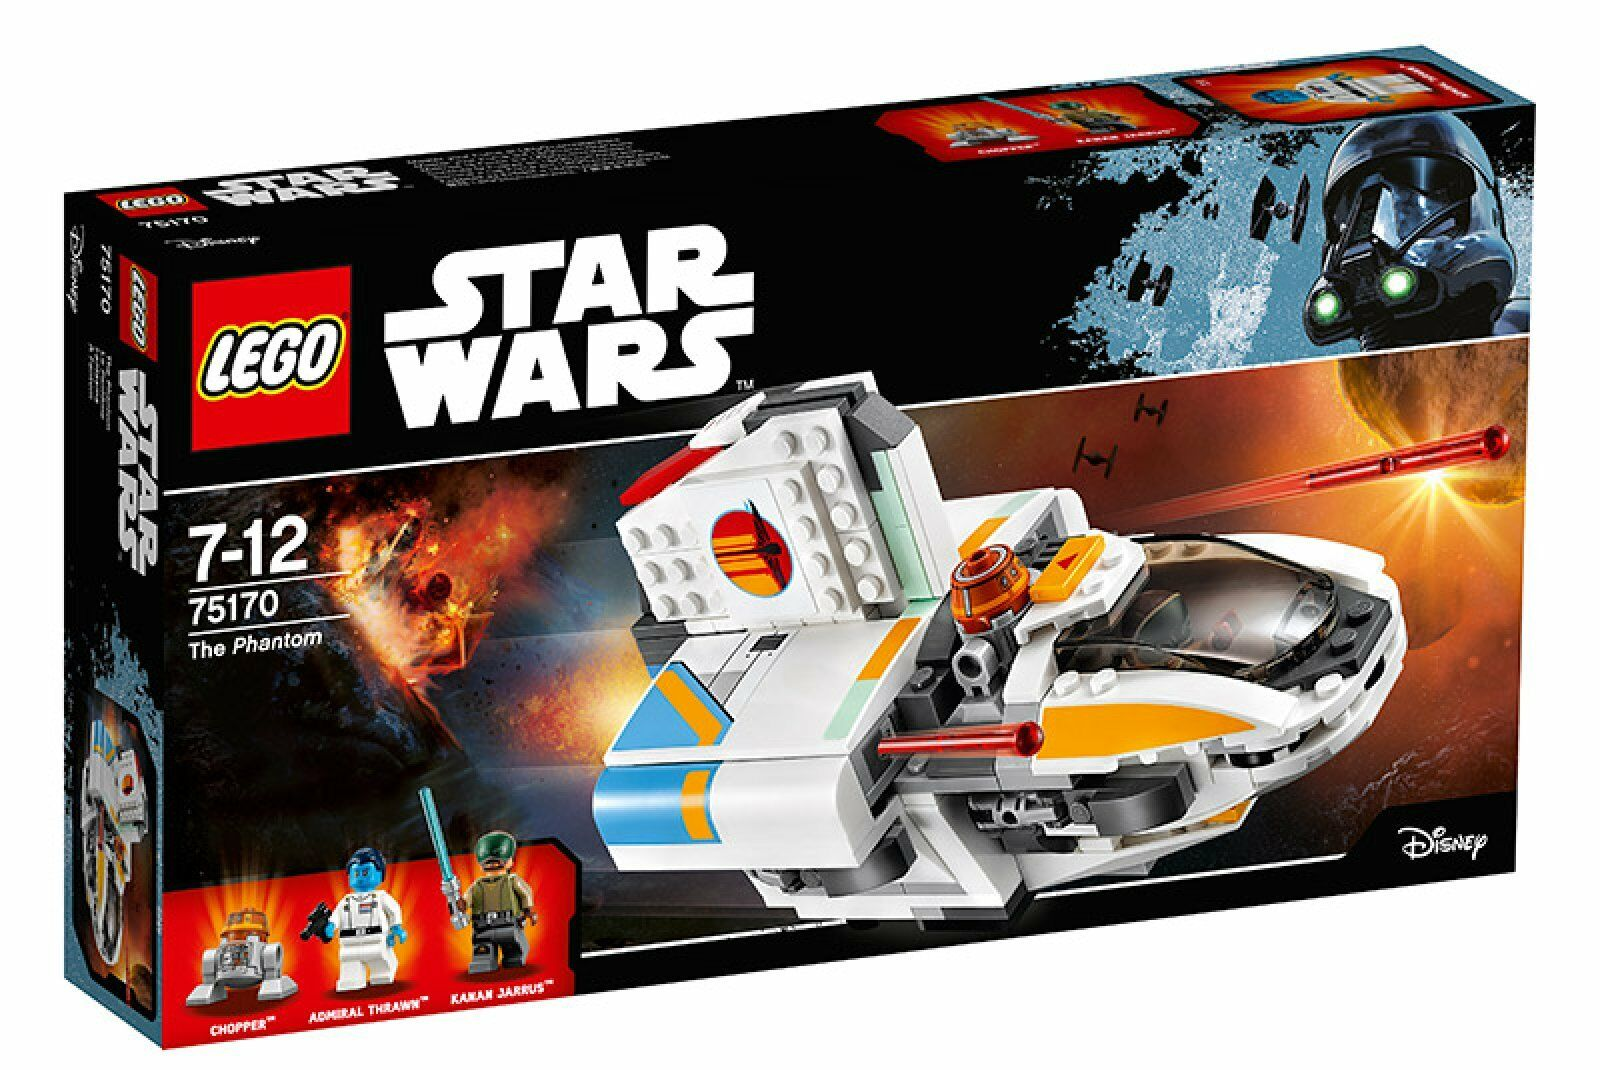 75170 LEGO Star Wars:The Phantom